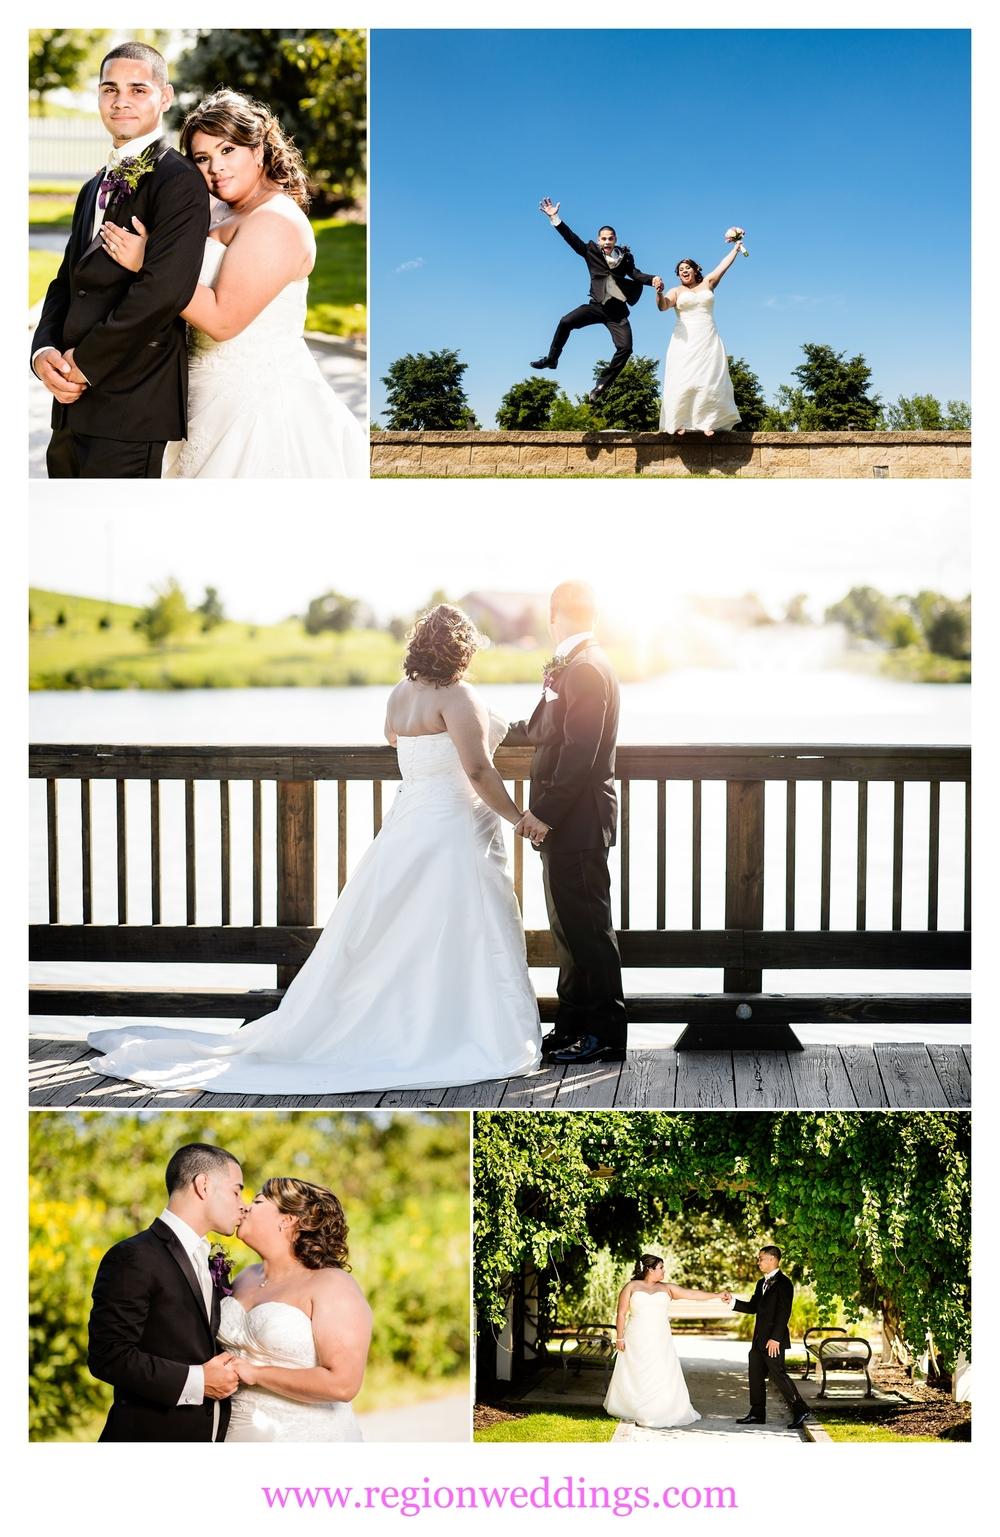 Summer wedding photos at Centennial Park in Munster, Indiana.